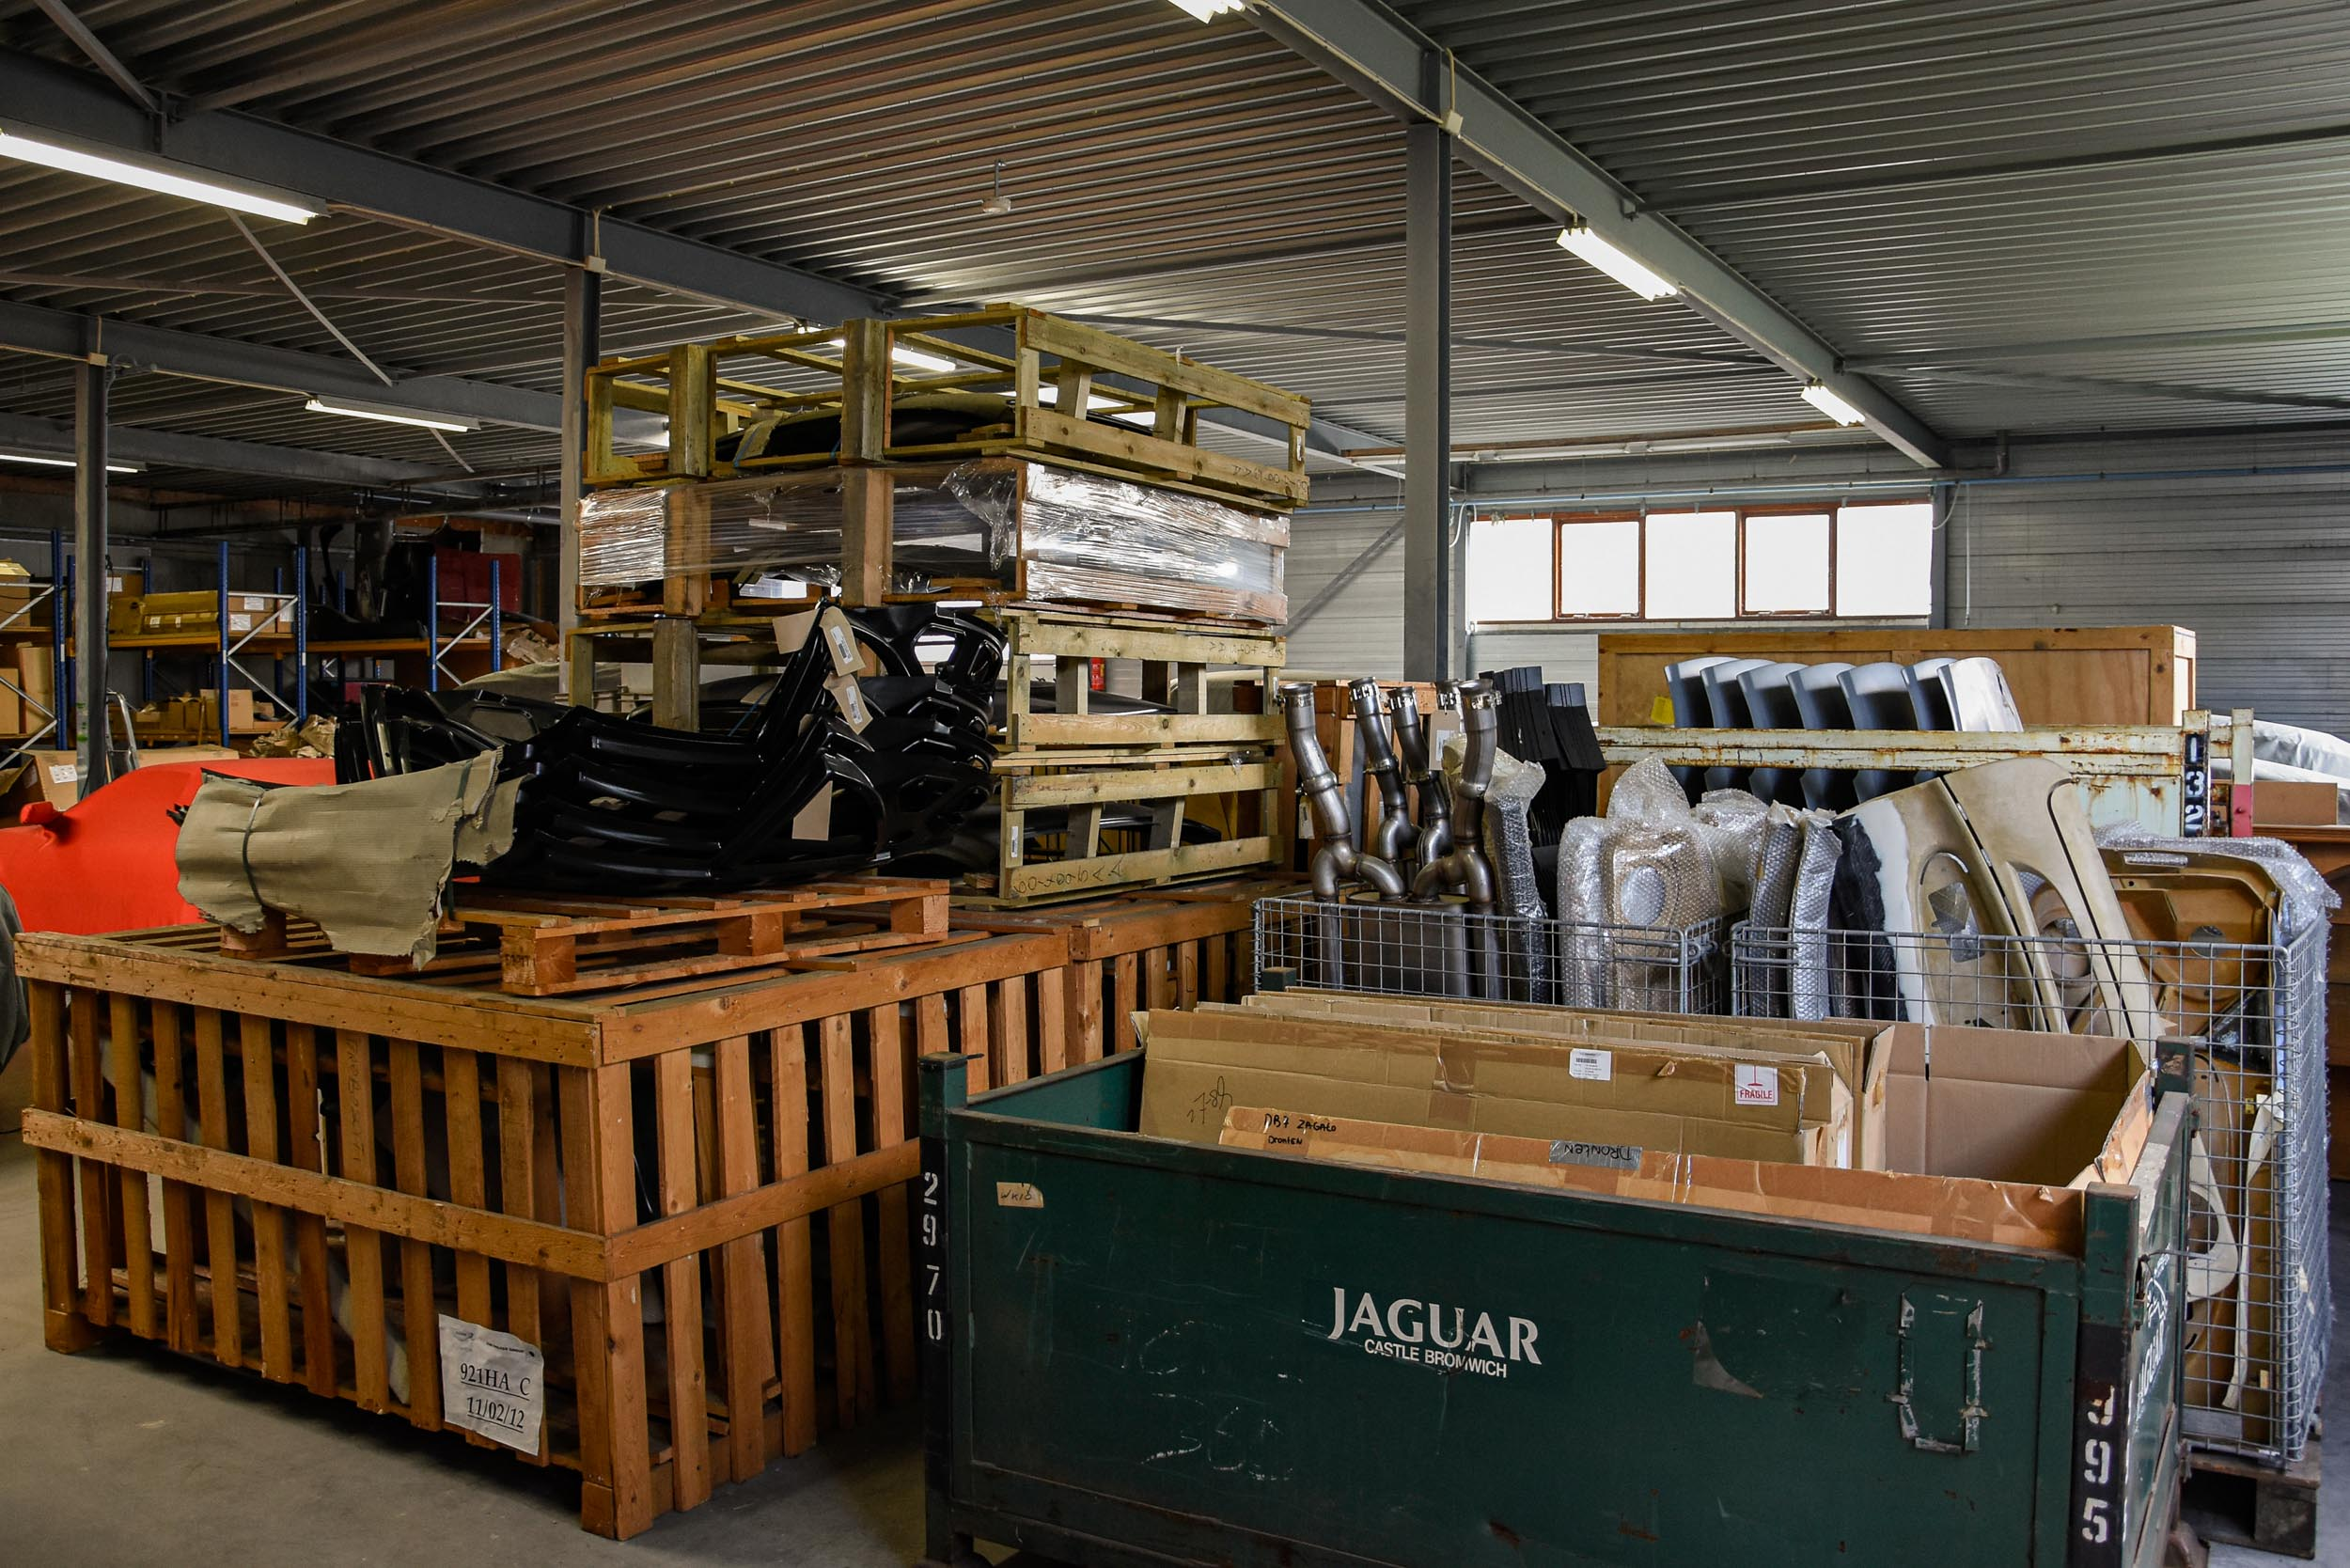 ASTON MARTIN ZAGATO PARTS NOBLE HOUSE CLASSICS NL